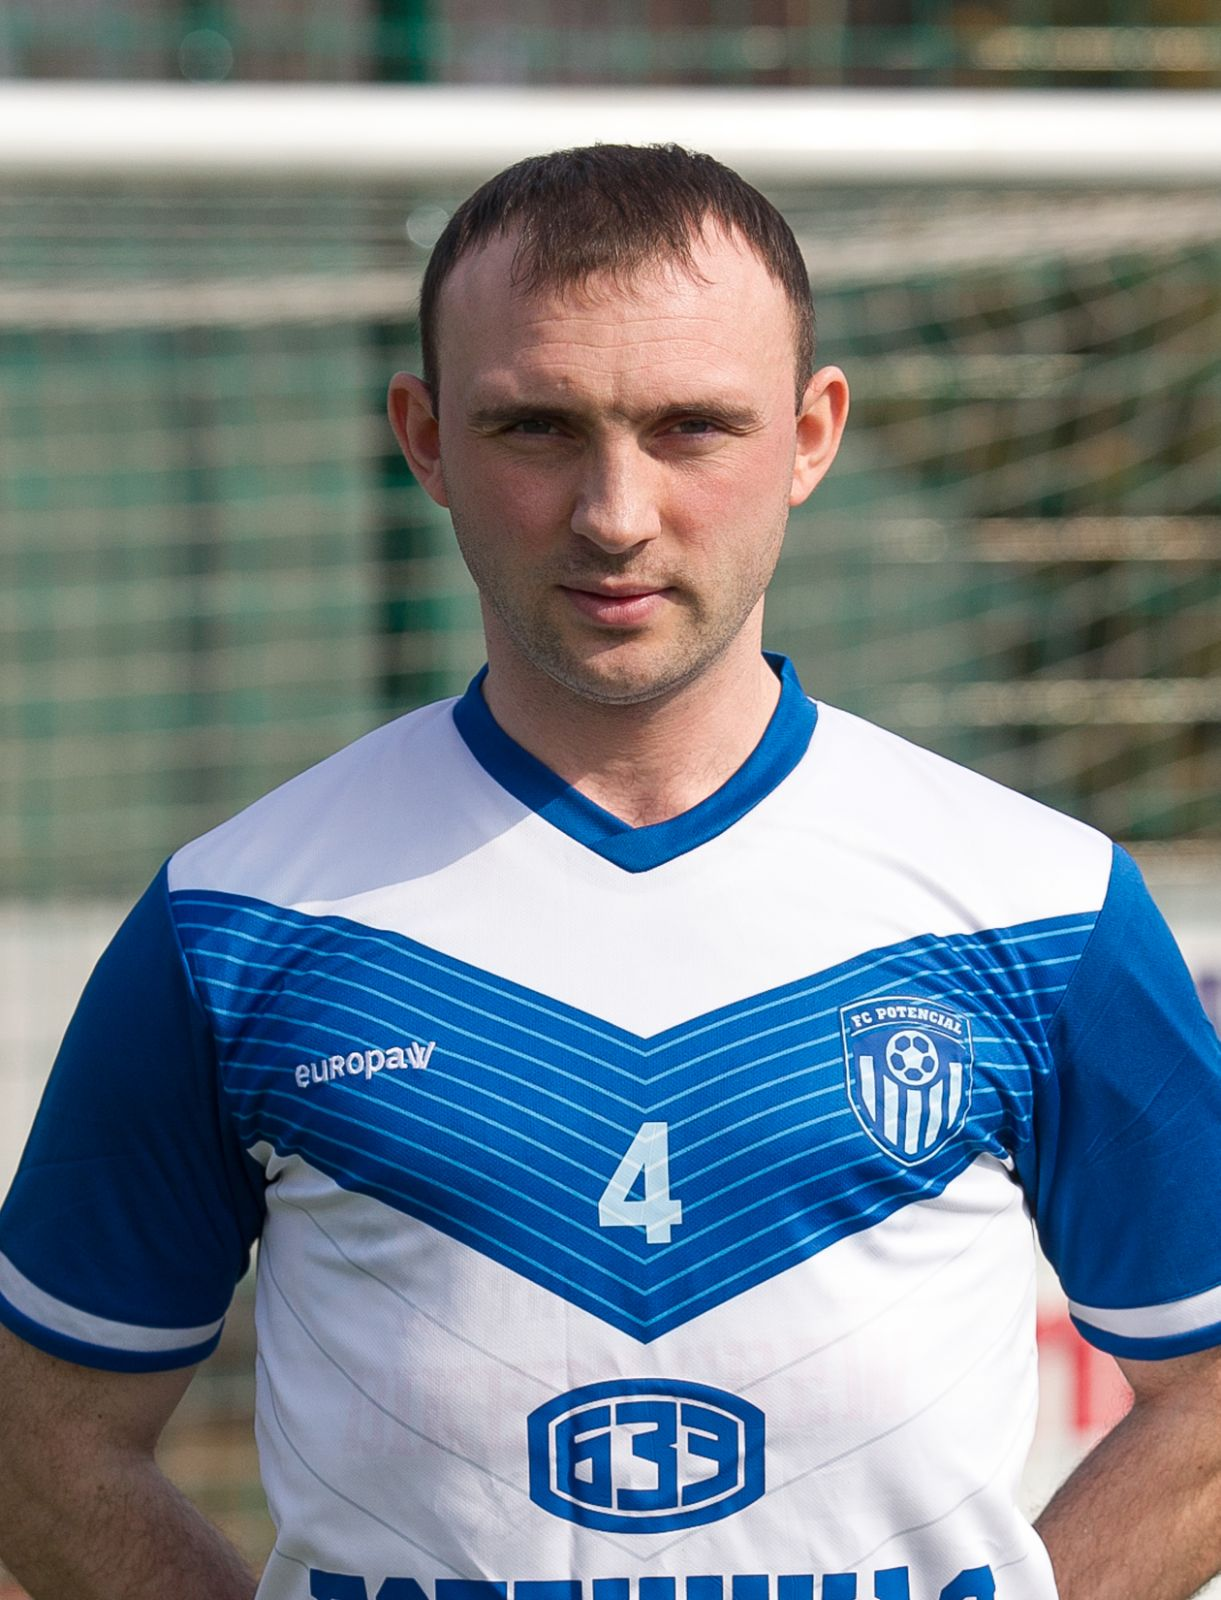 Дарьев Валерий